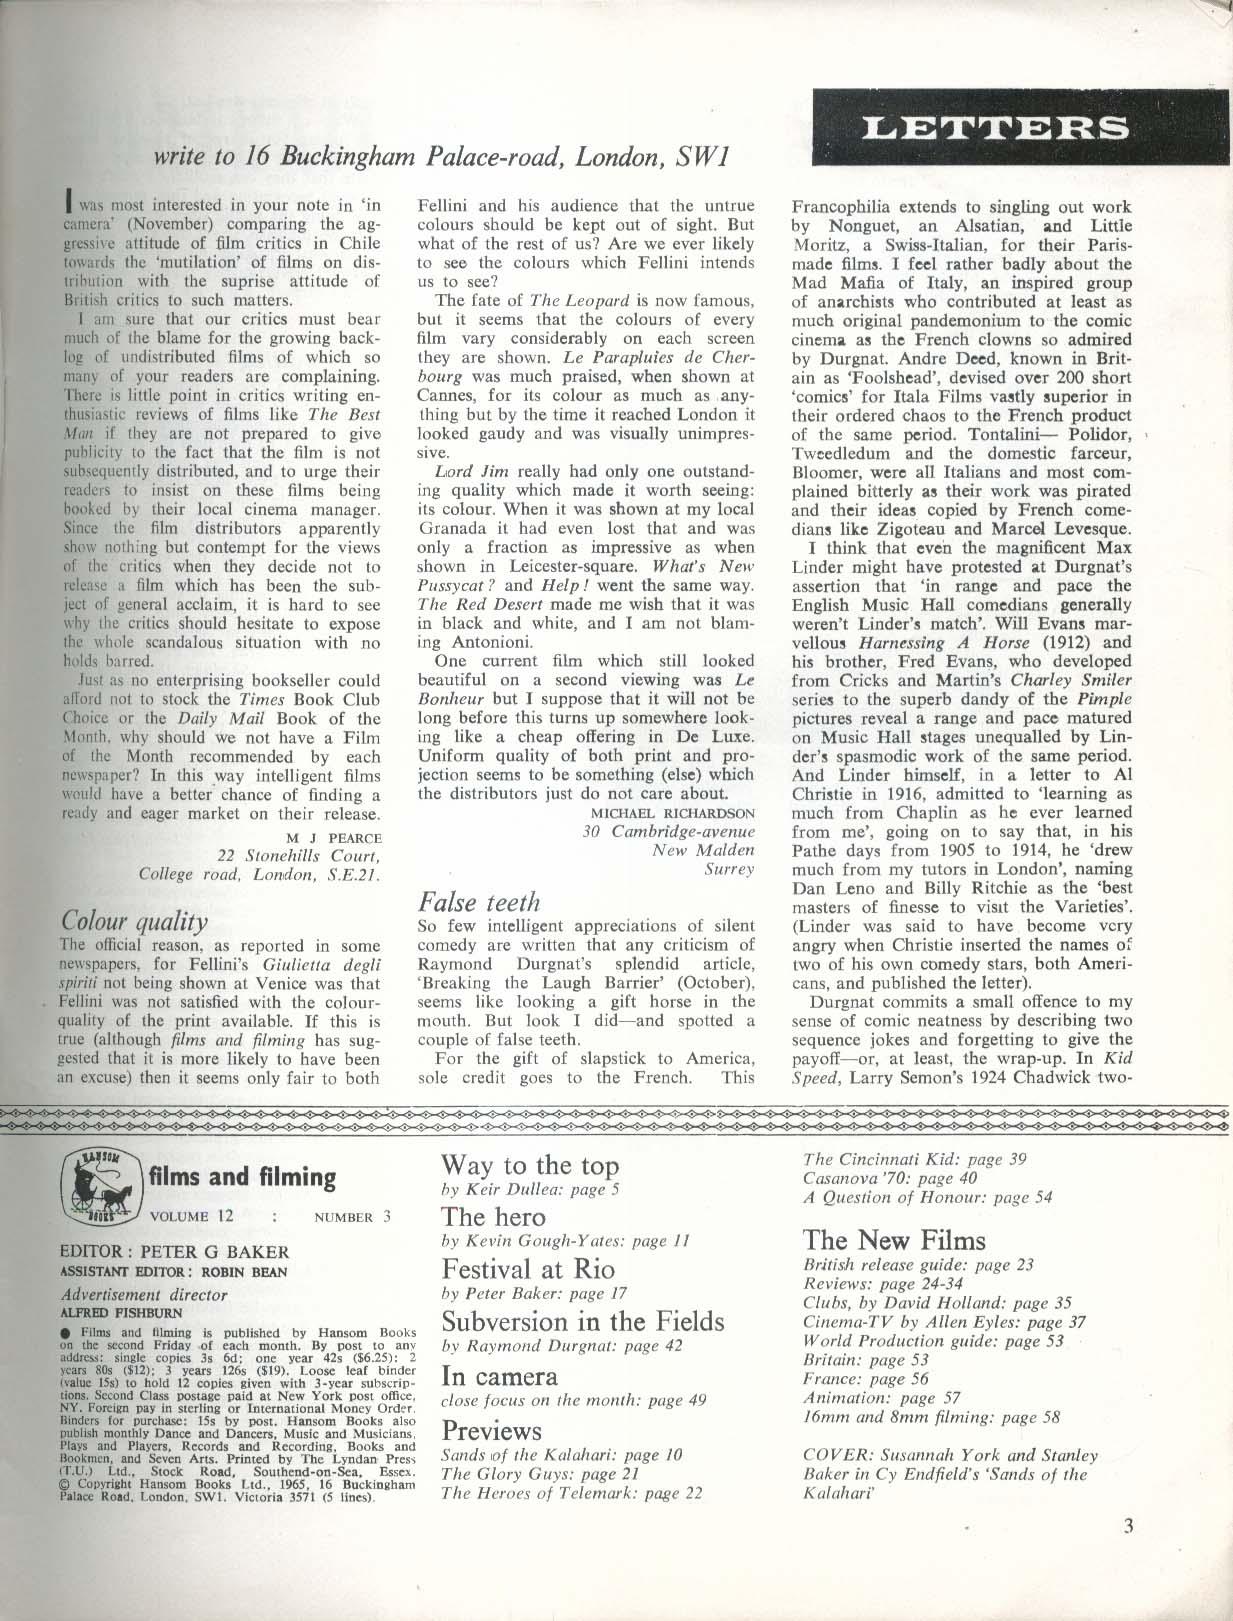 FILMS & FILMING Keir Dullea Kevin Gough-Yates Raymond Durgnat 12 1965